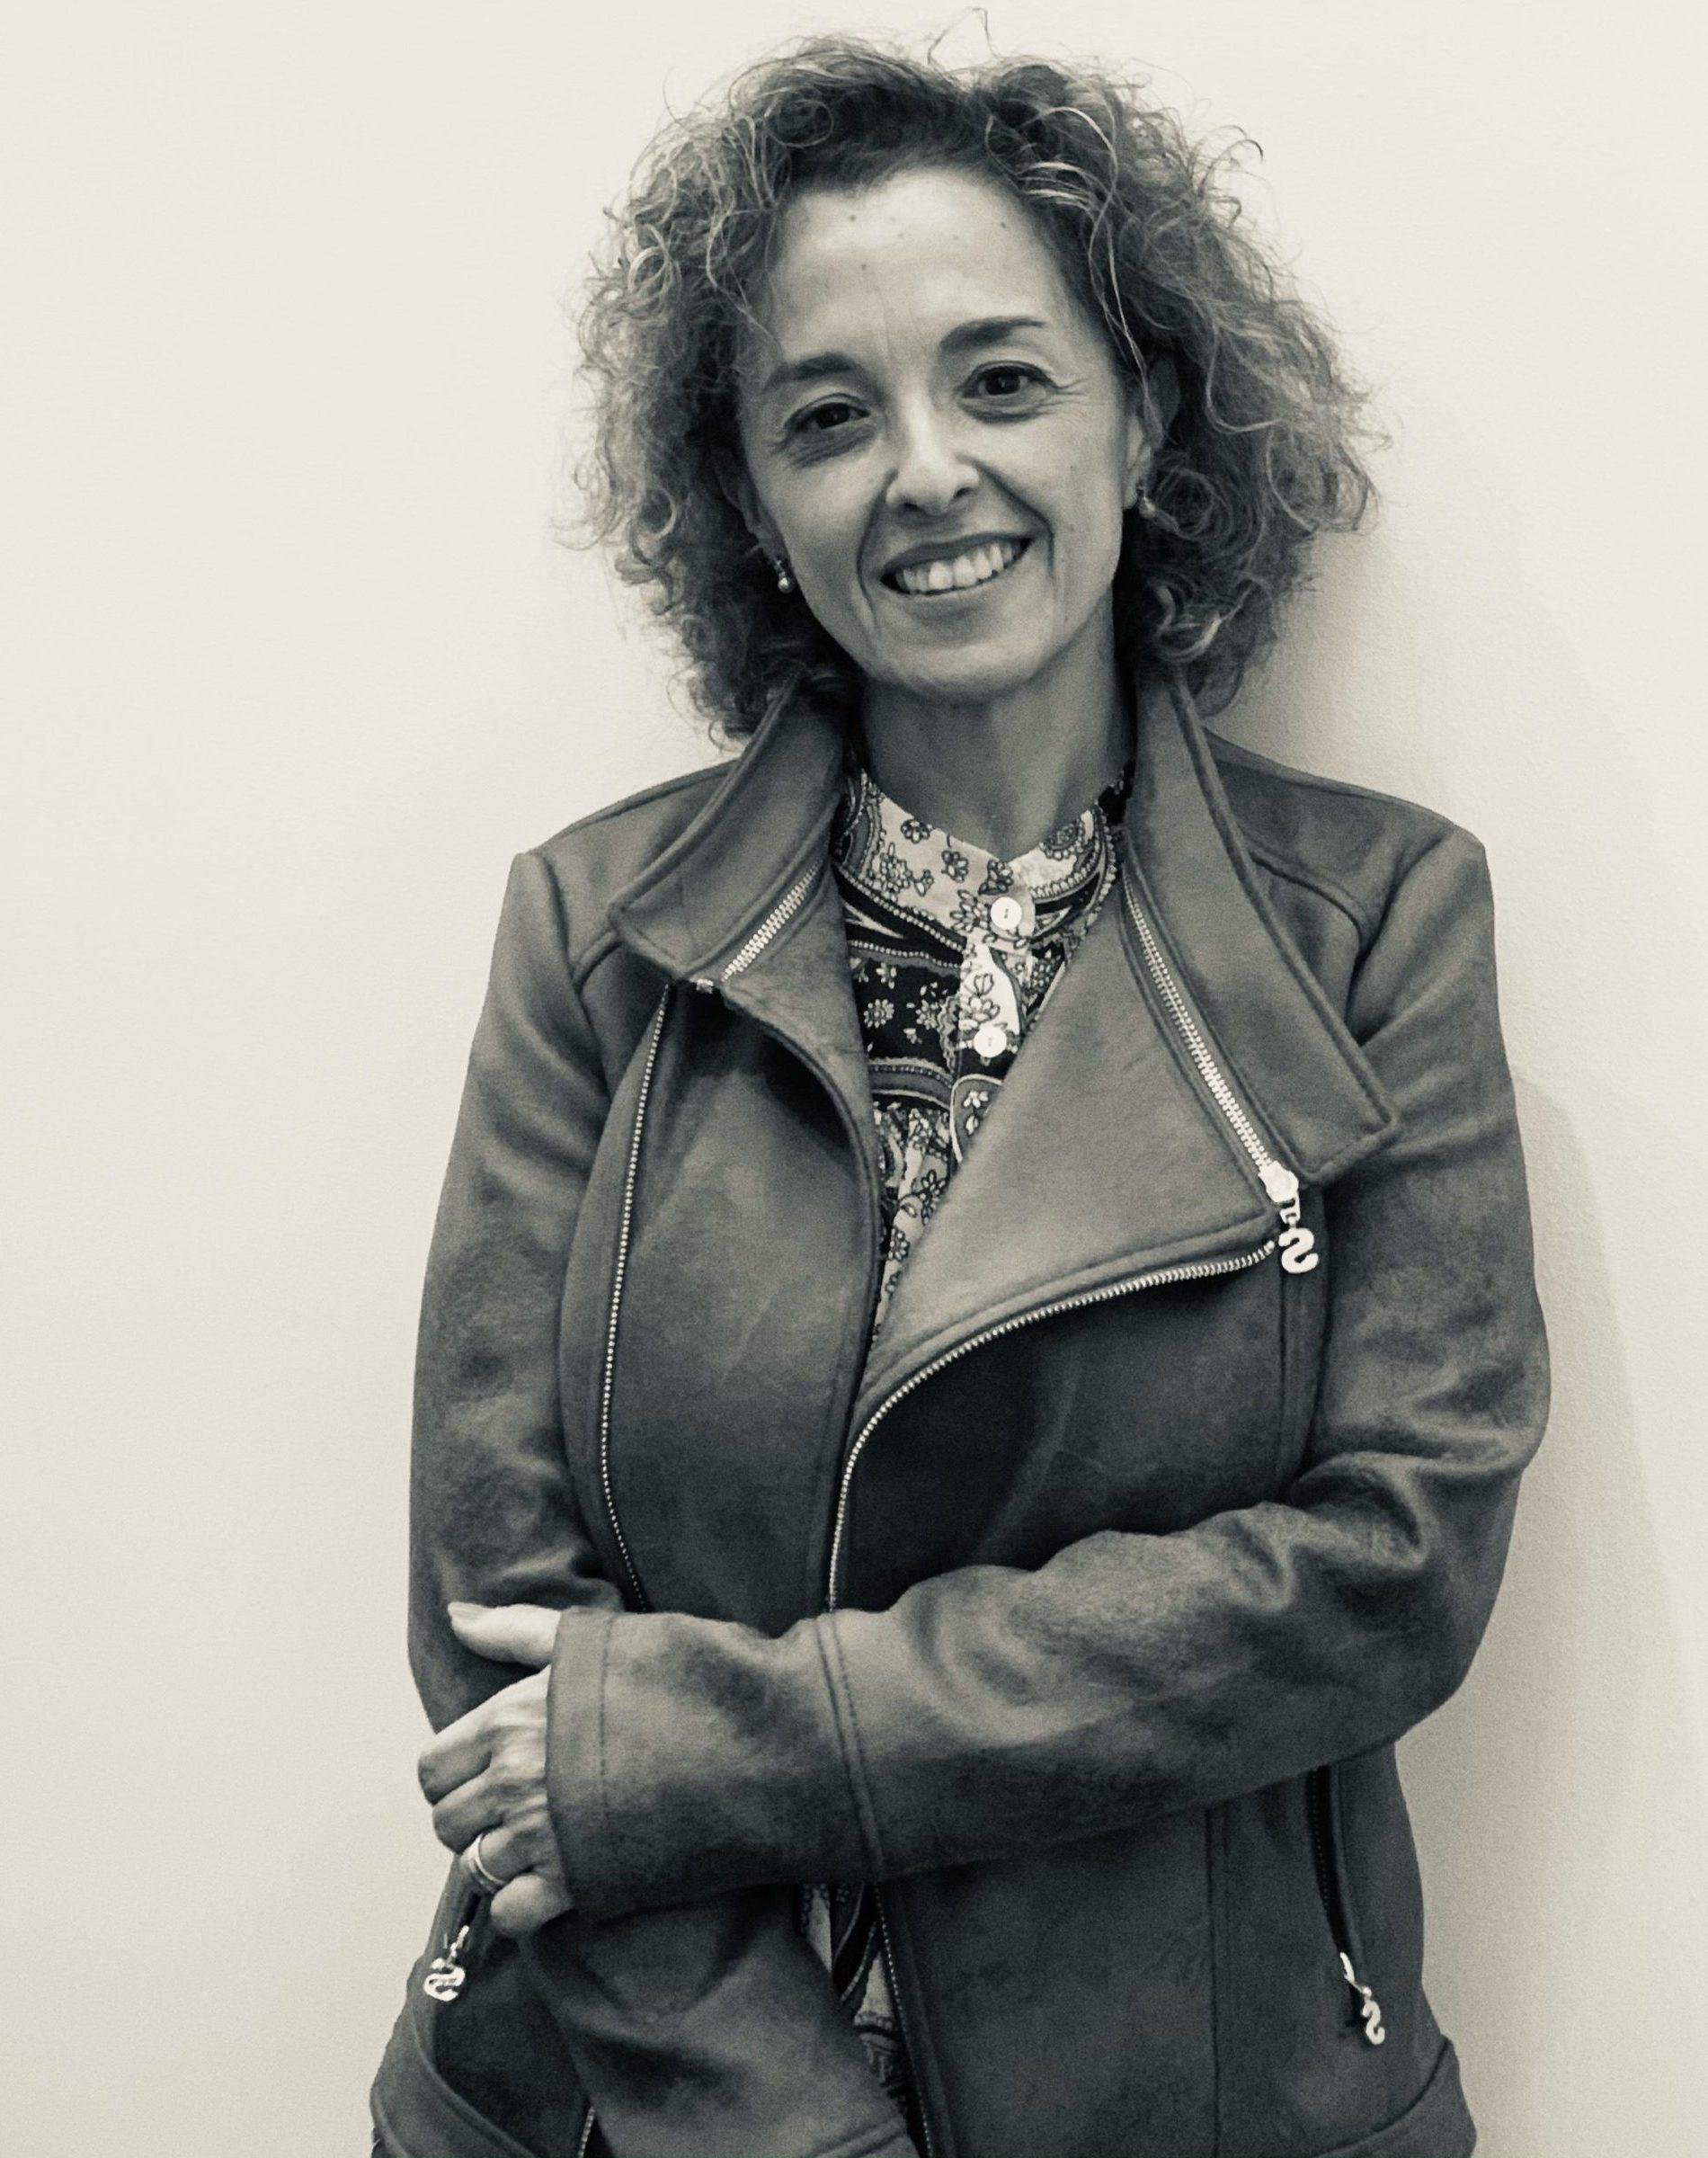 Caterina Di Somma